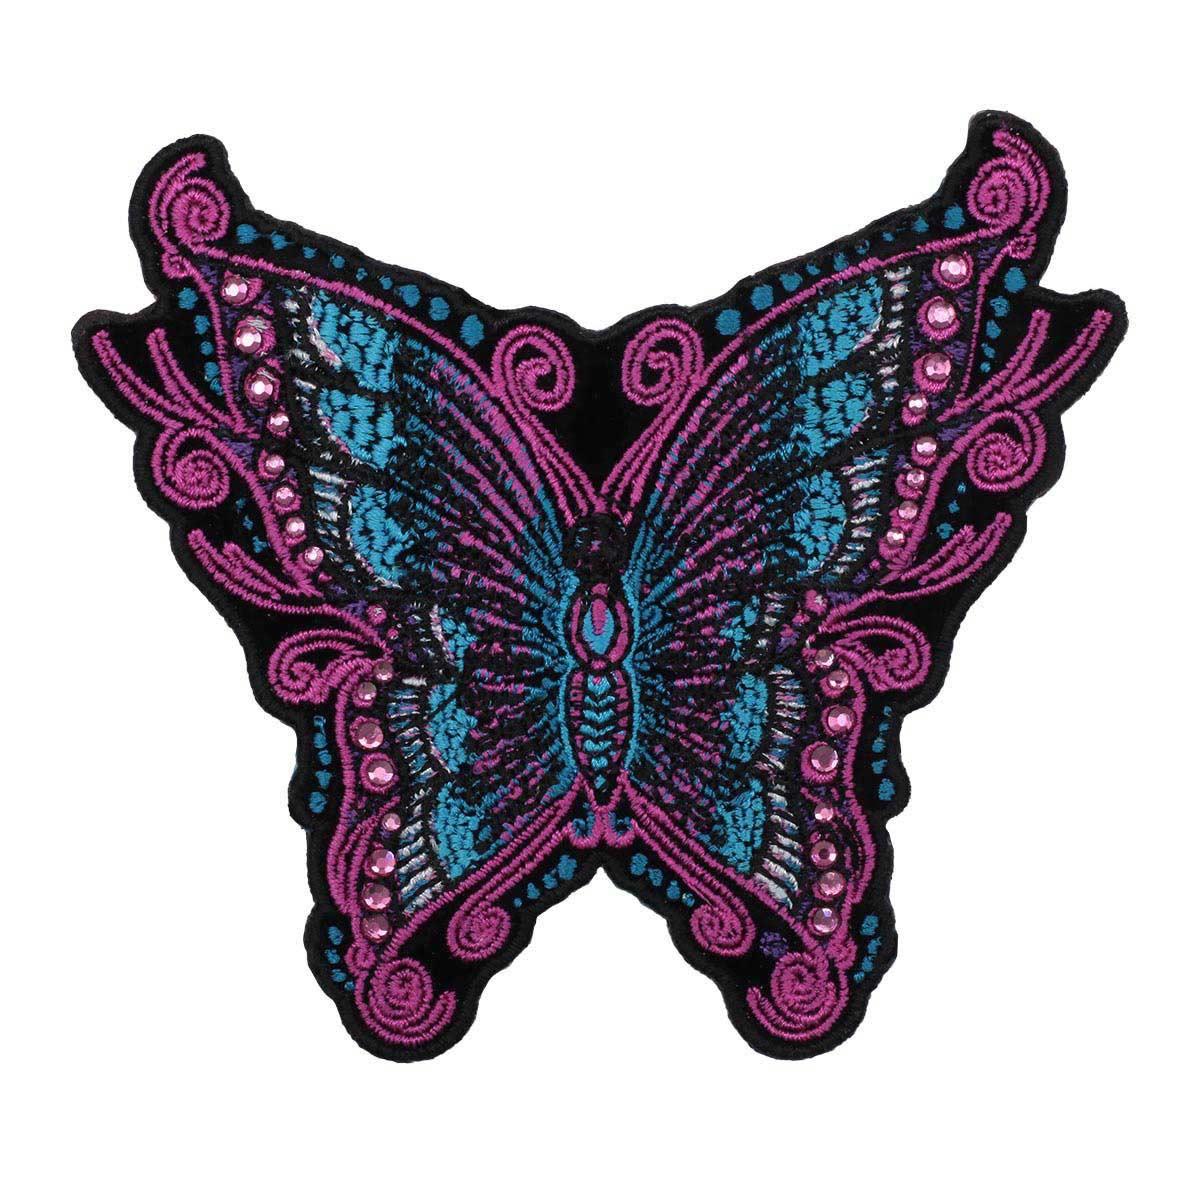 Термоаппликация 'Бабочка со стразами' 9,5*10,5см Hobby&Pro